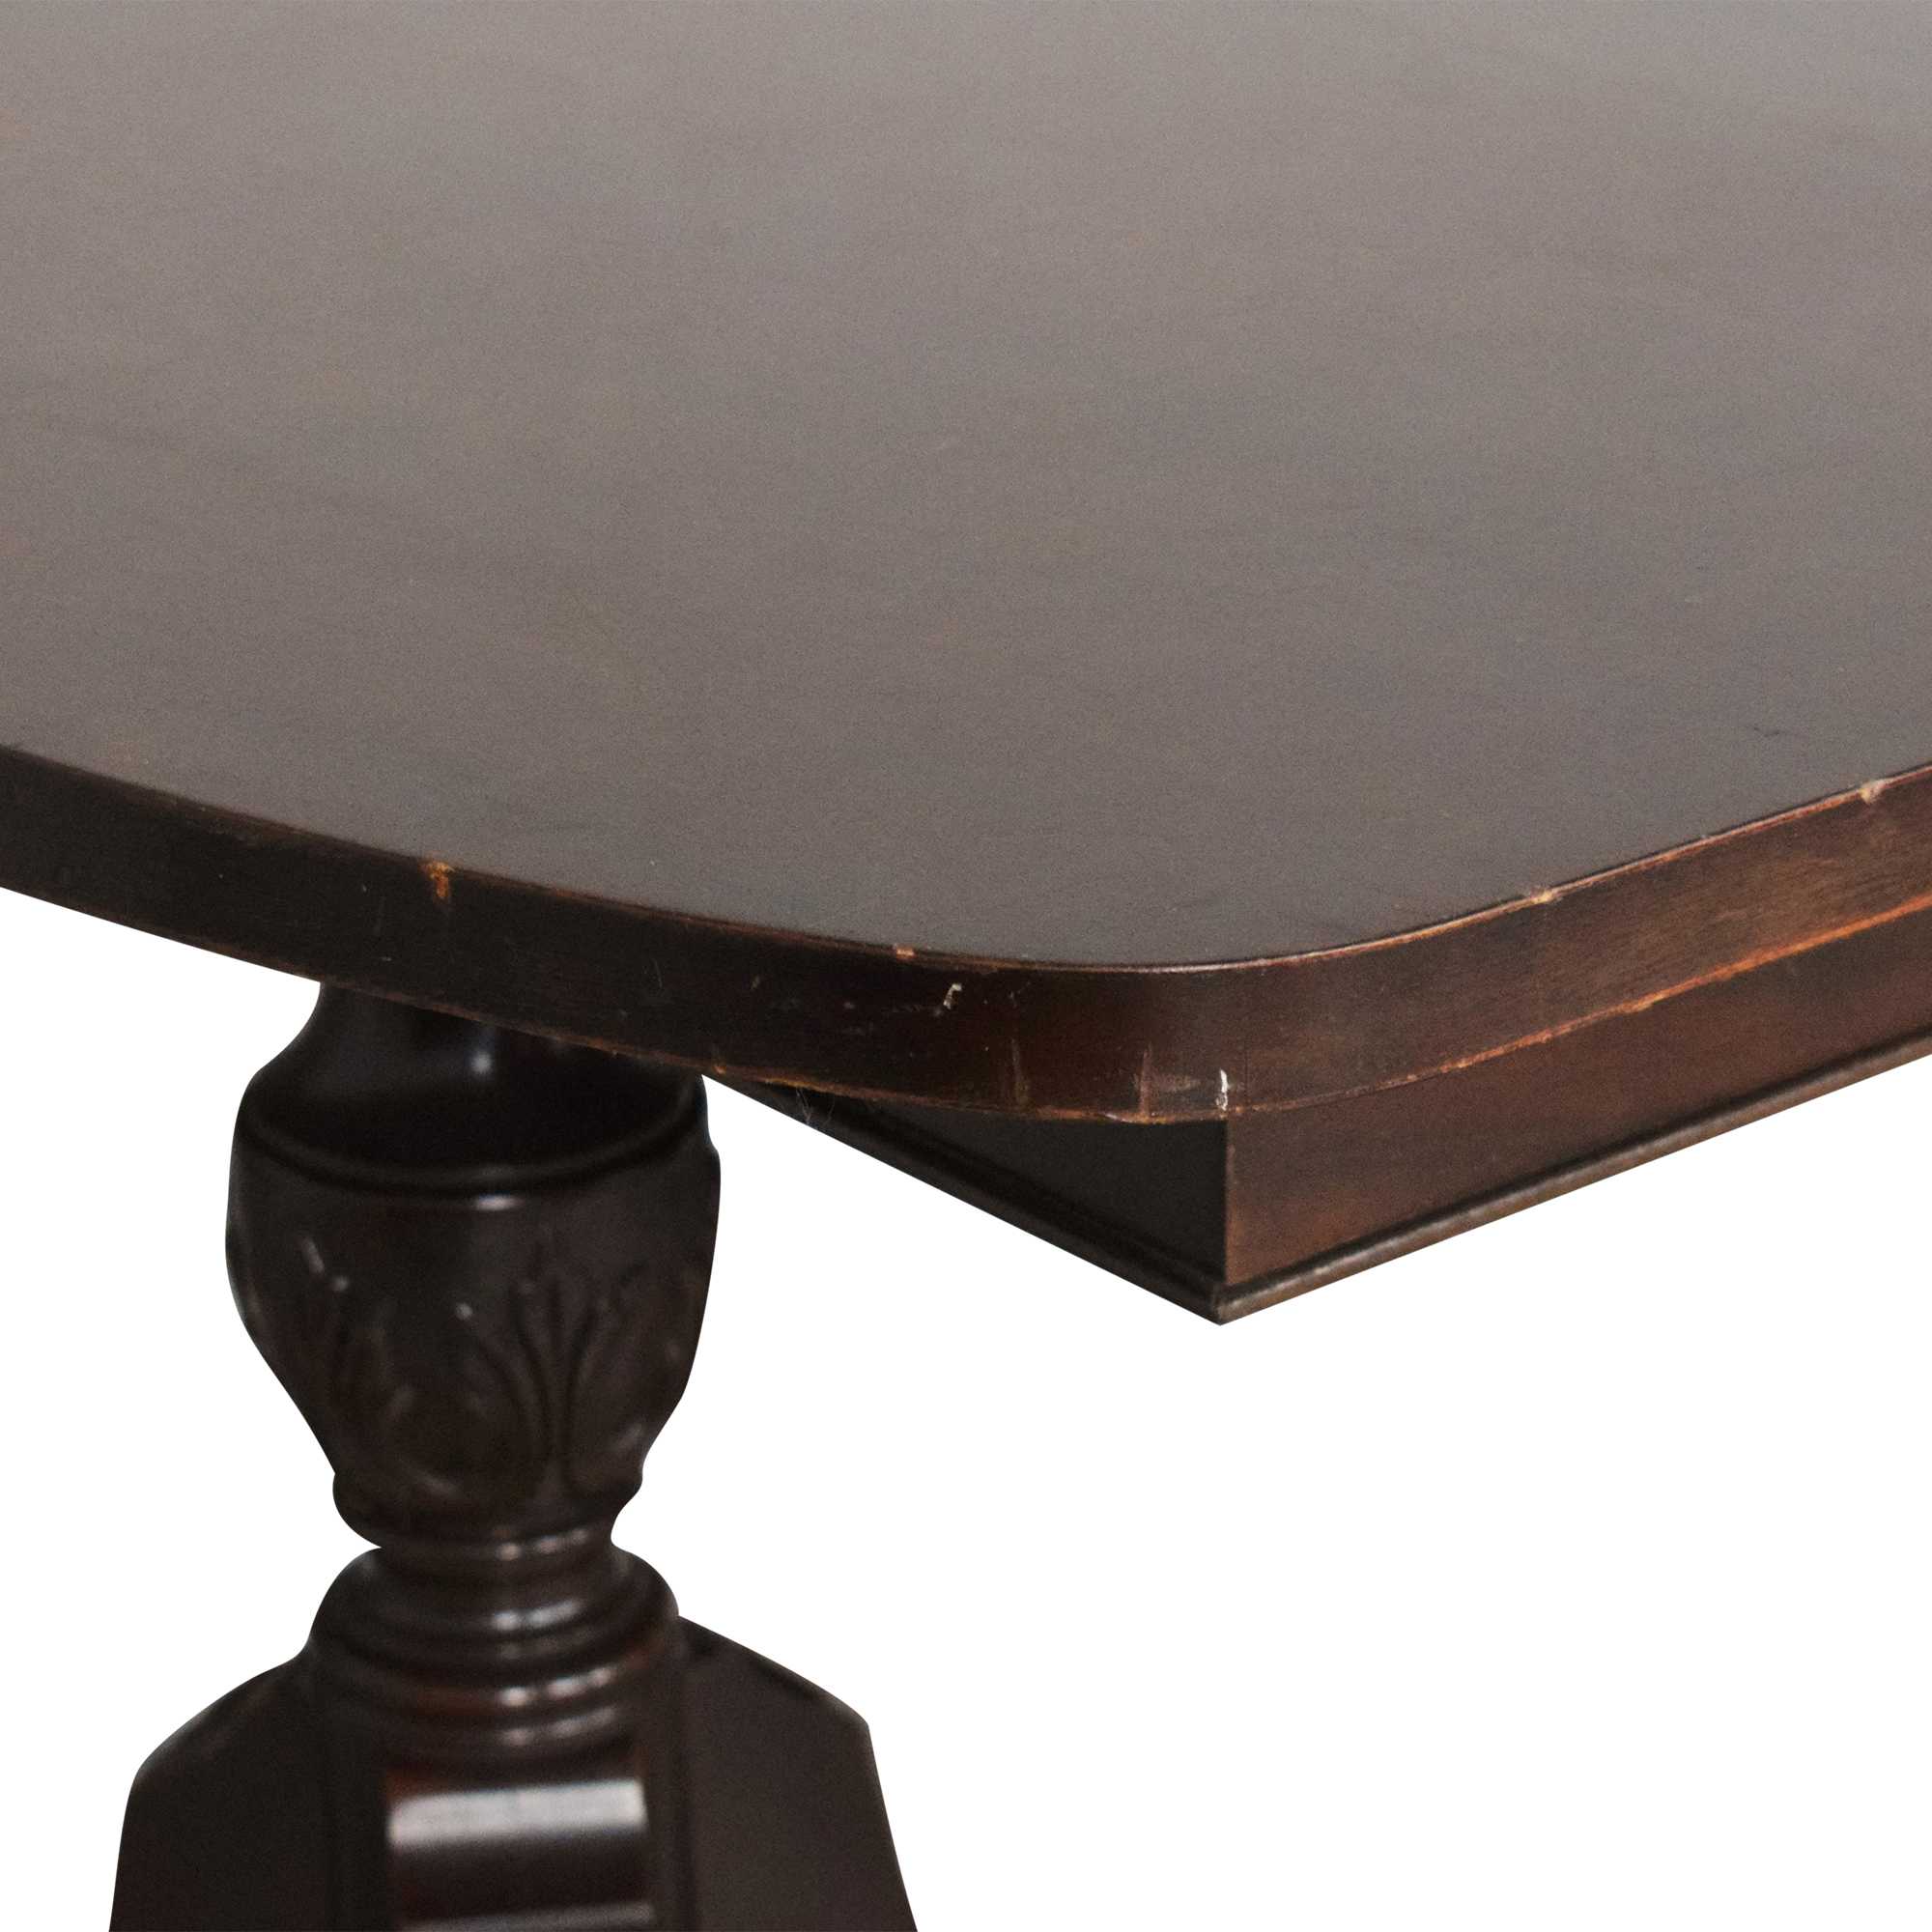 Finch Fine Furniture Finch Fine Furniture Double Pedestal Dining Table ma